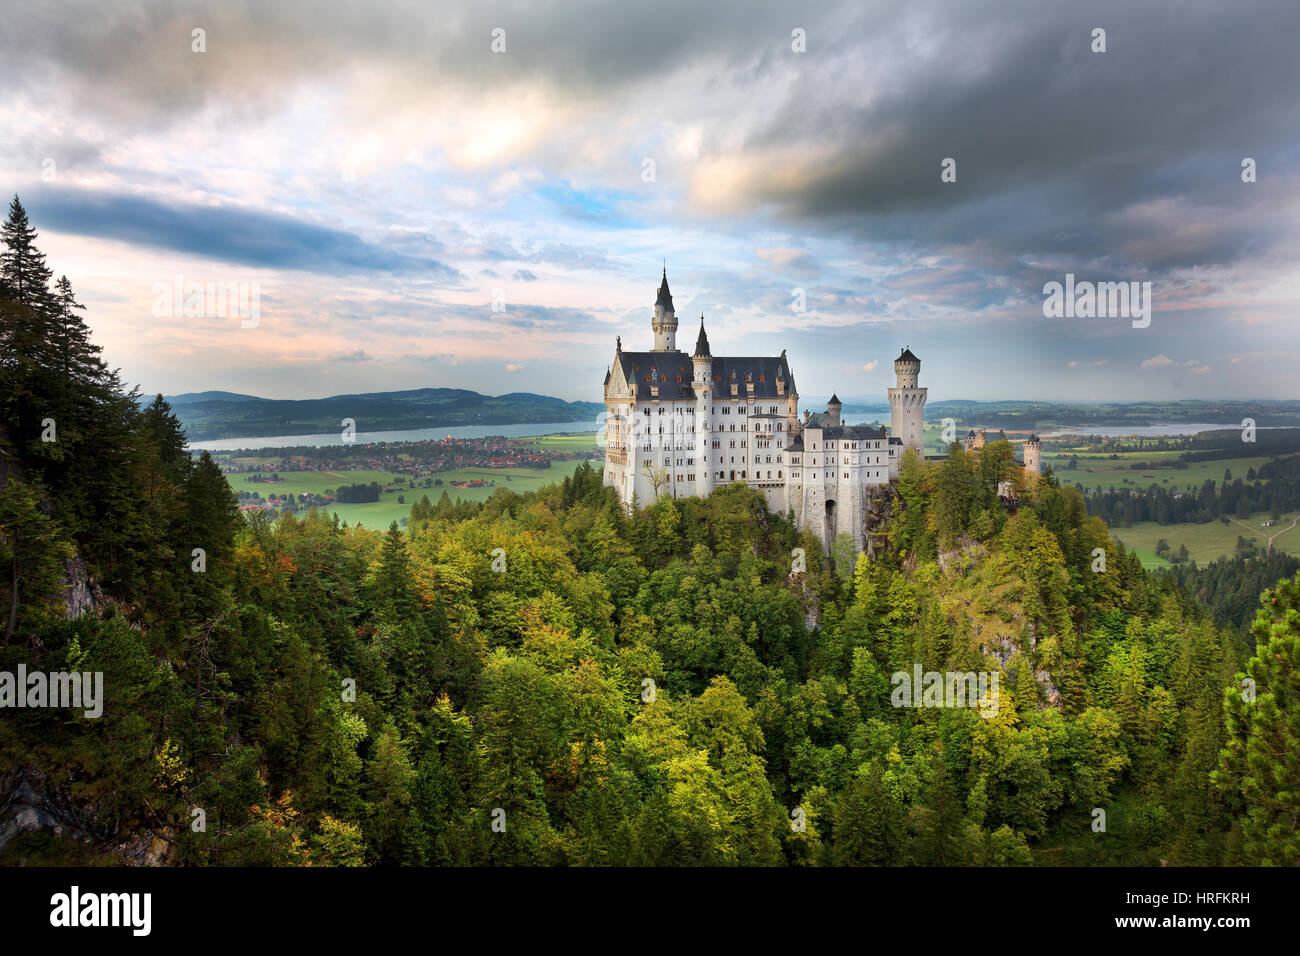 19th Century Romanesque Revival Neuschwanstein Castle, Bavaria, Germany - Stock Image